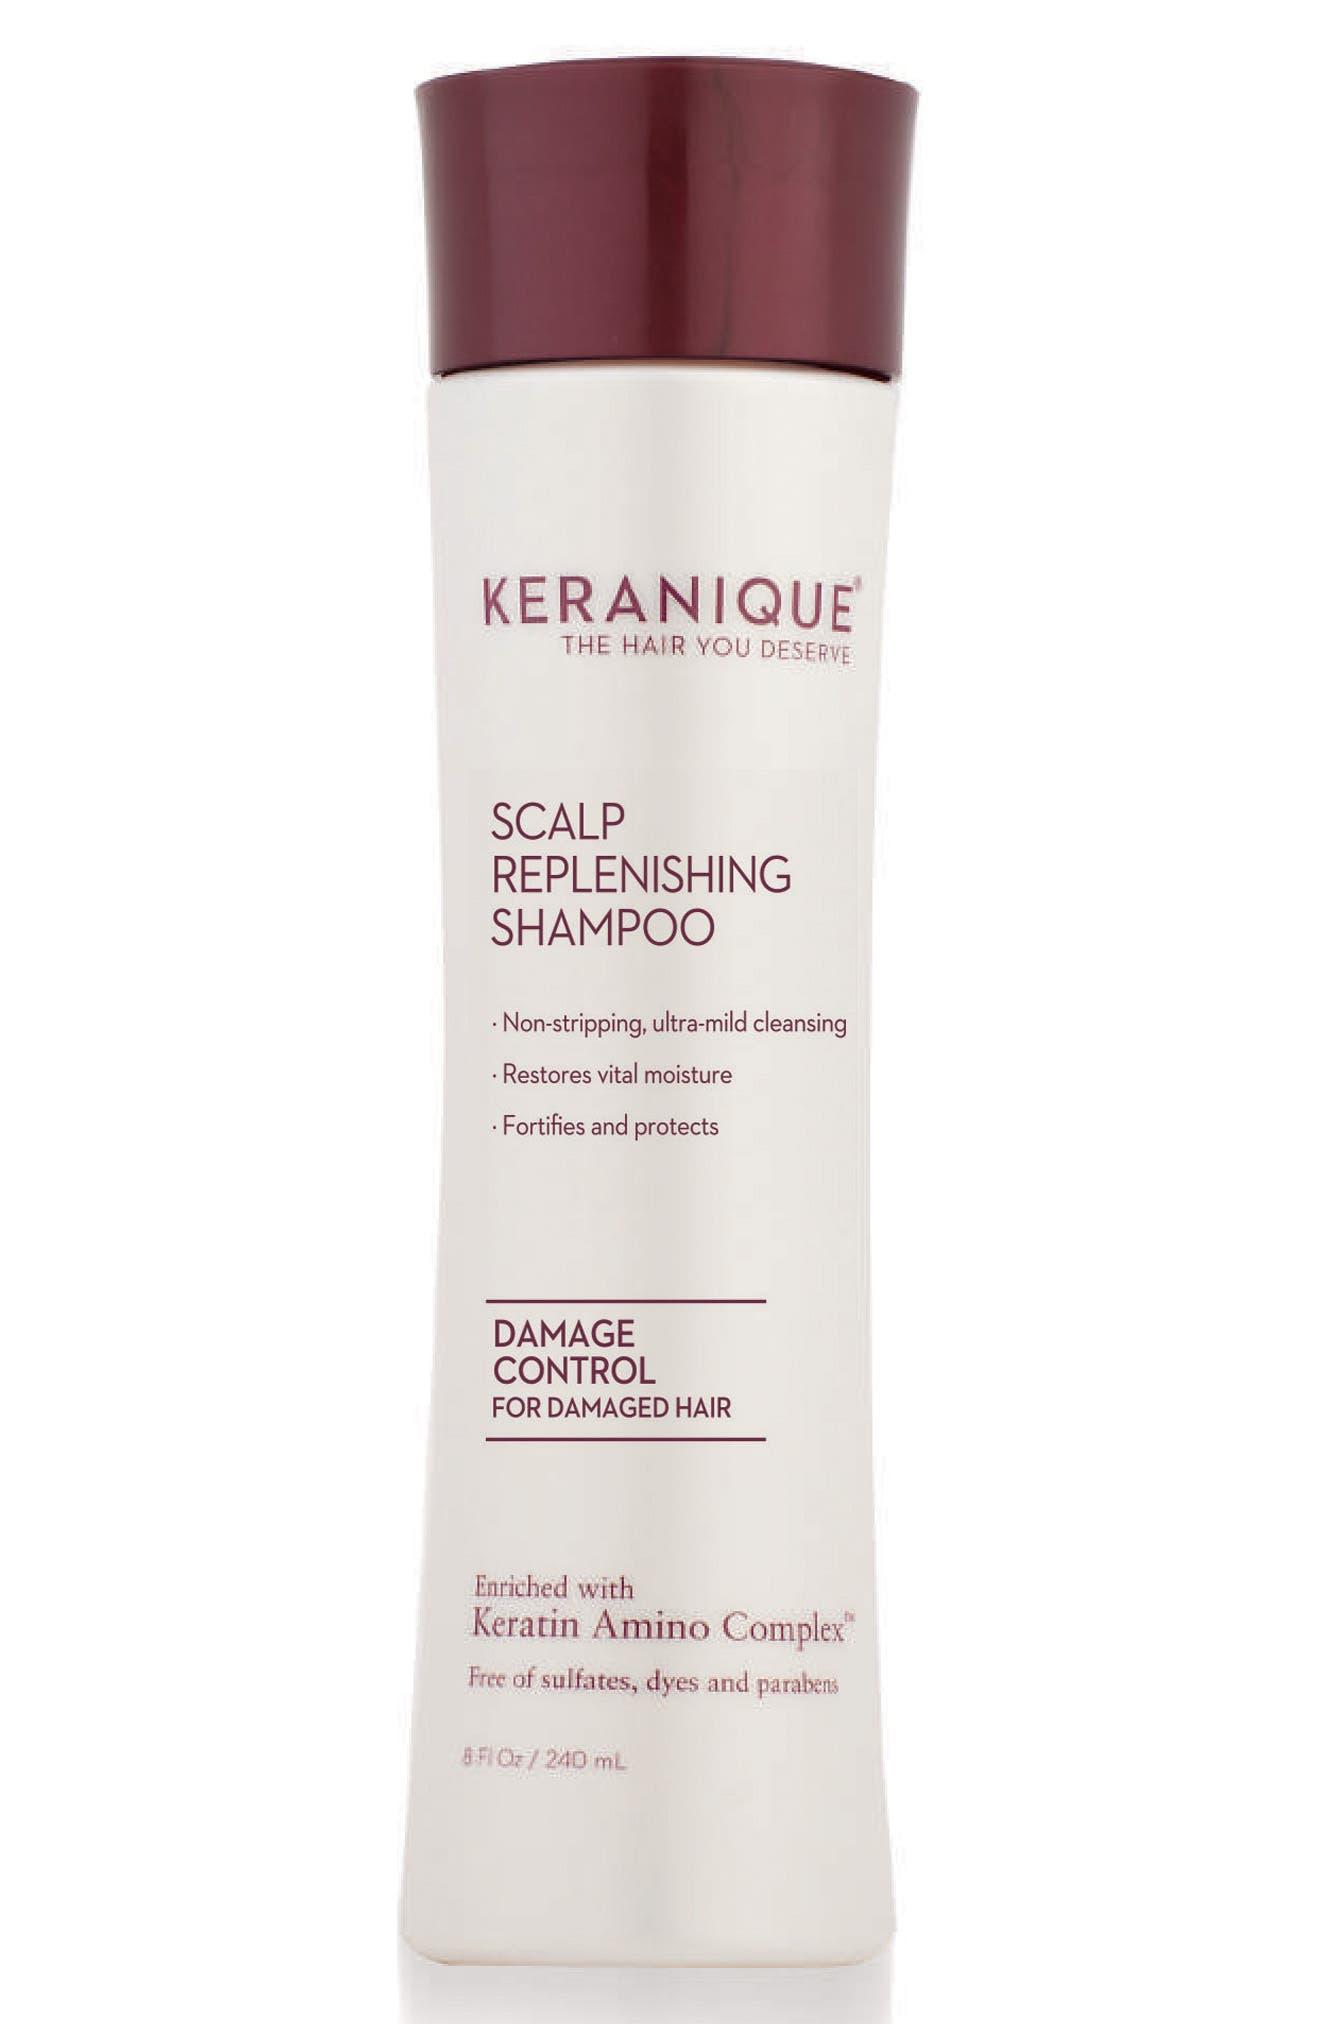 Alternate Image 1 Selected - Keranique Scalp Replenishing Shampoo Damage Control